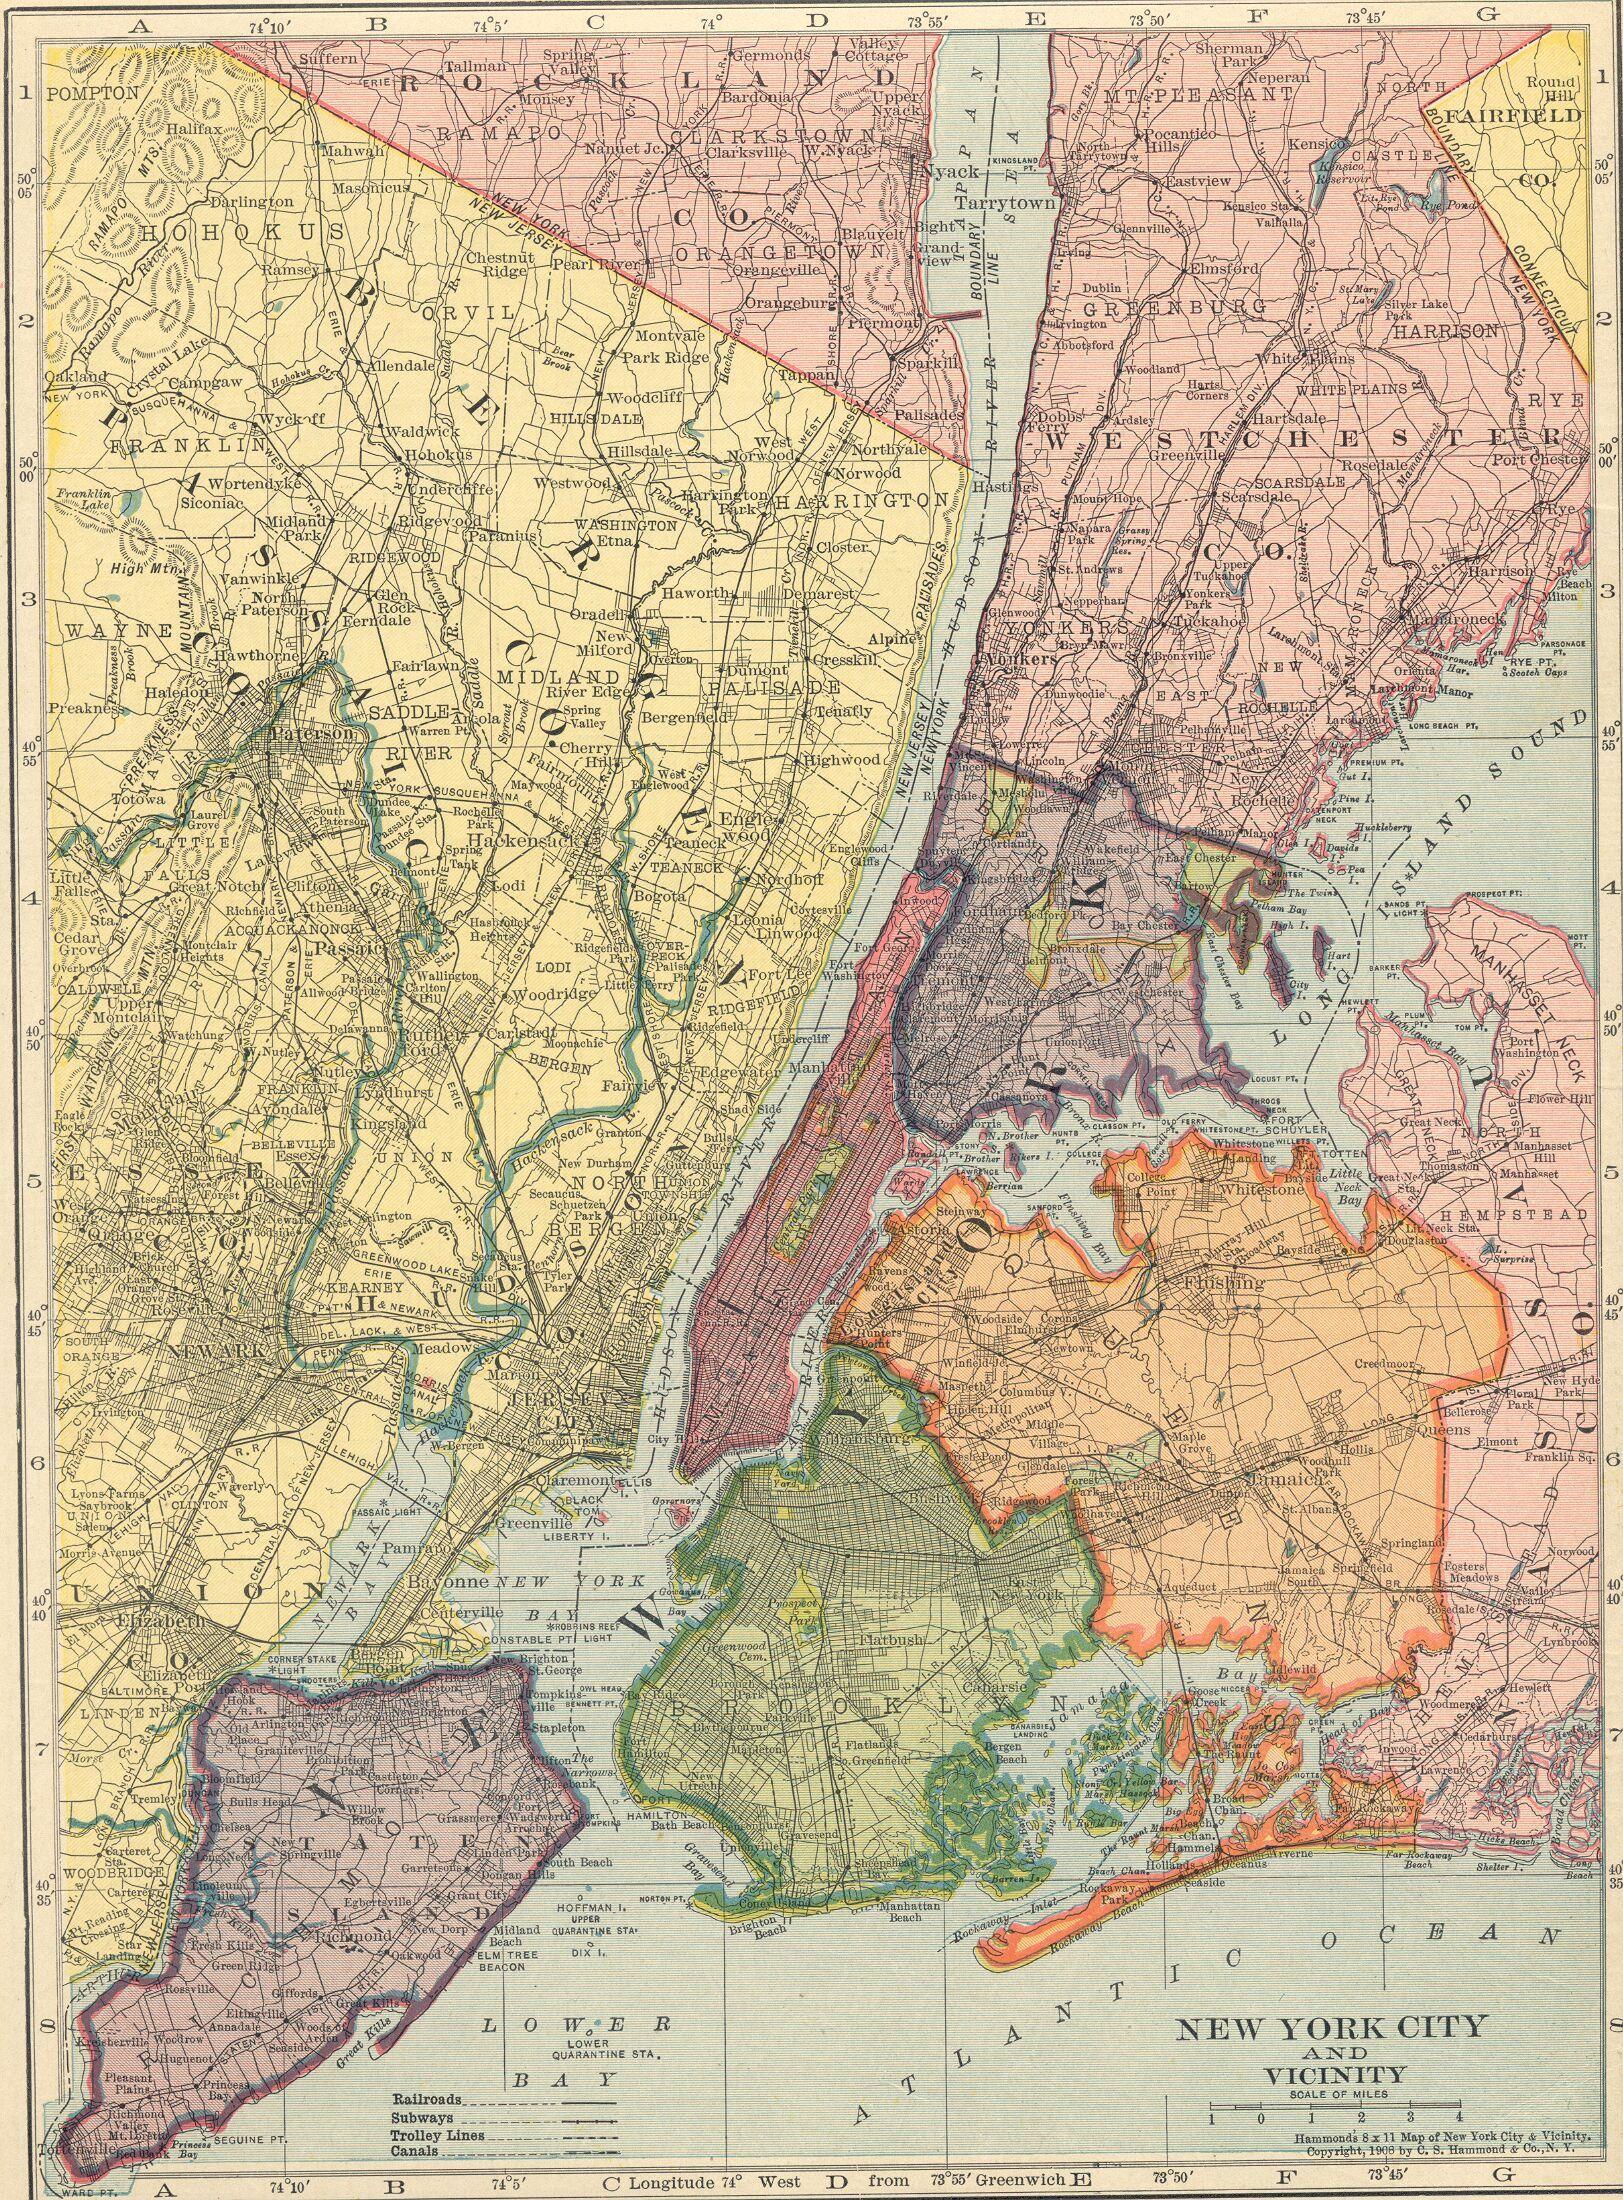 Geography of New York City 1906NYCvicinitymapjpg 16232200